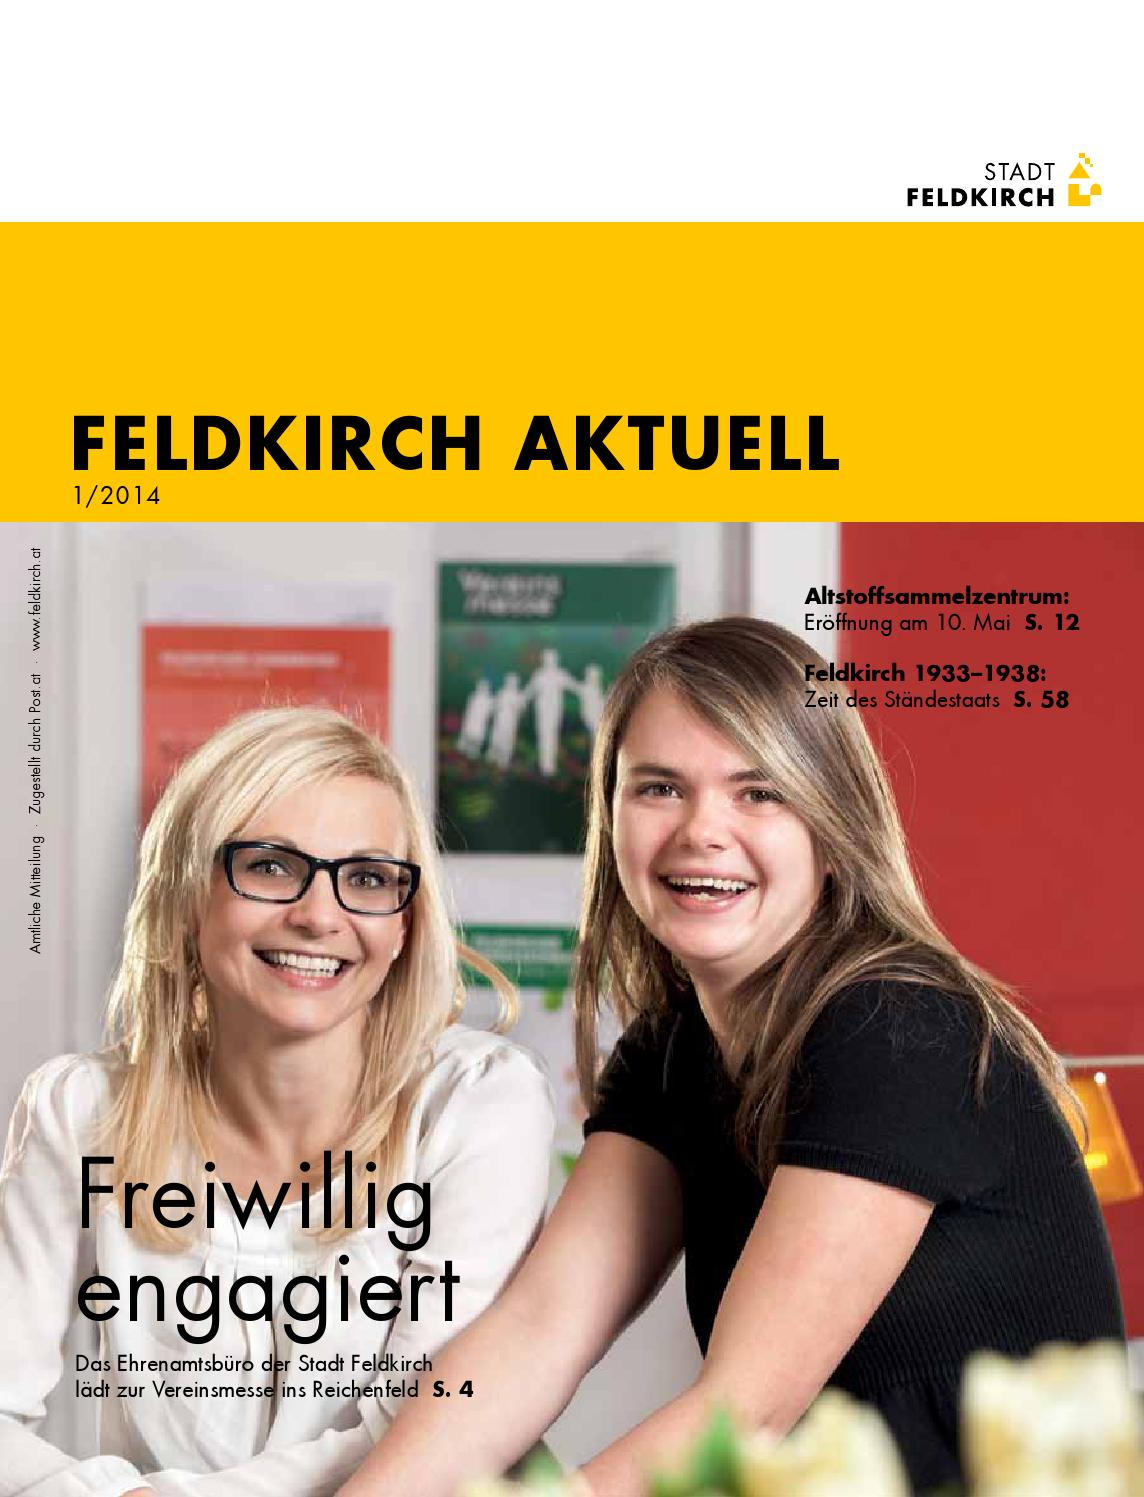 kennenlernen in Feldkirch - Erotik & Sex - huggology.com